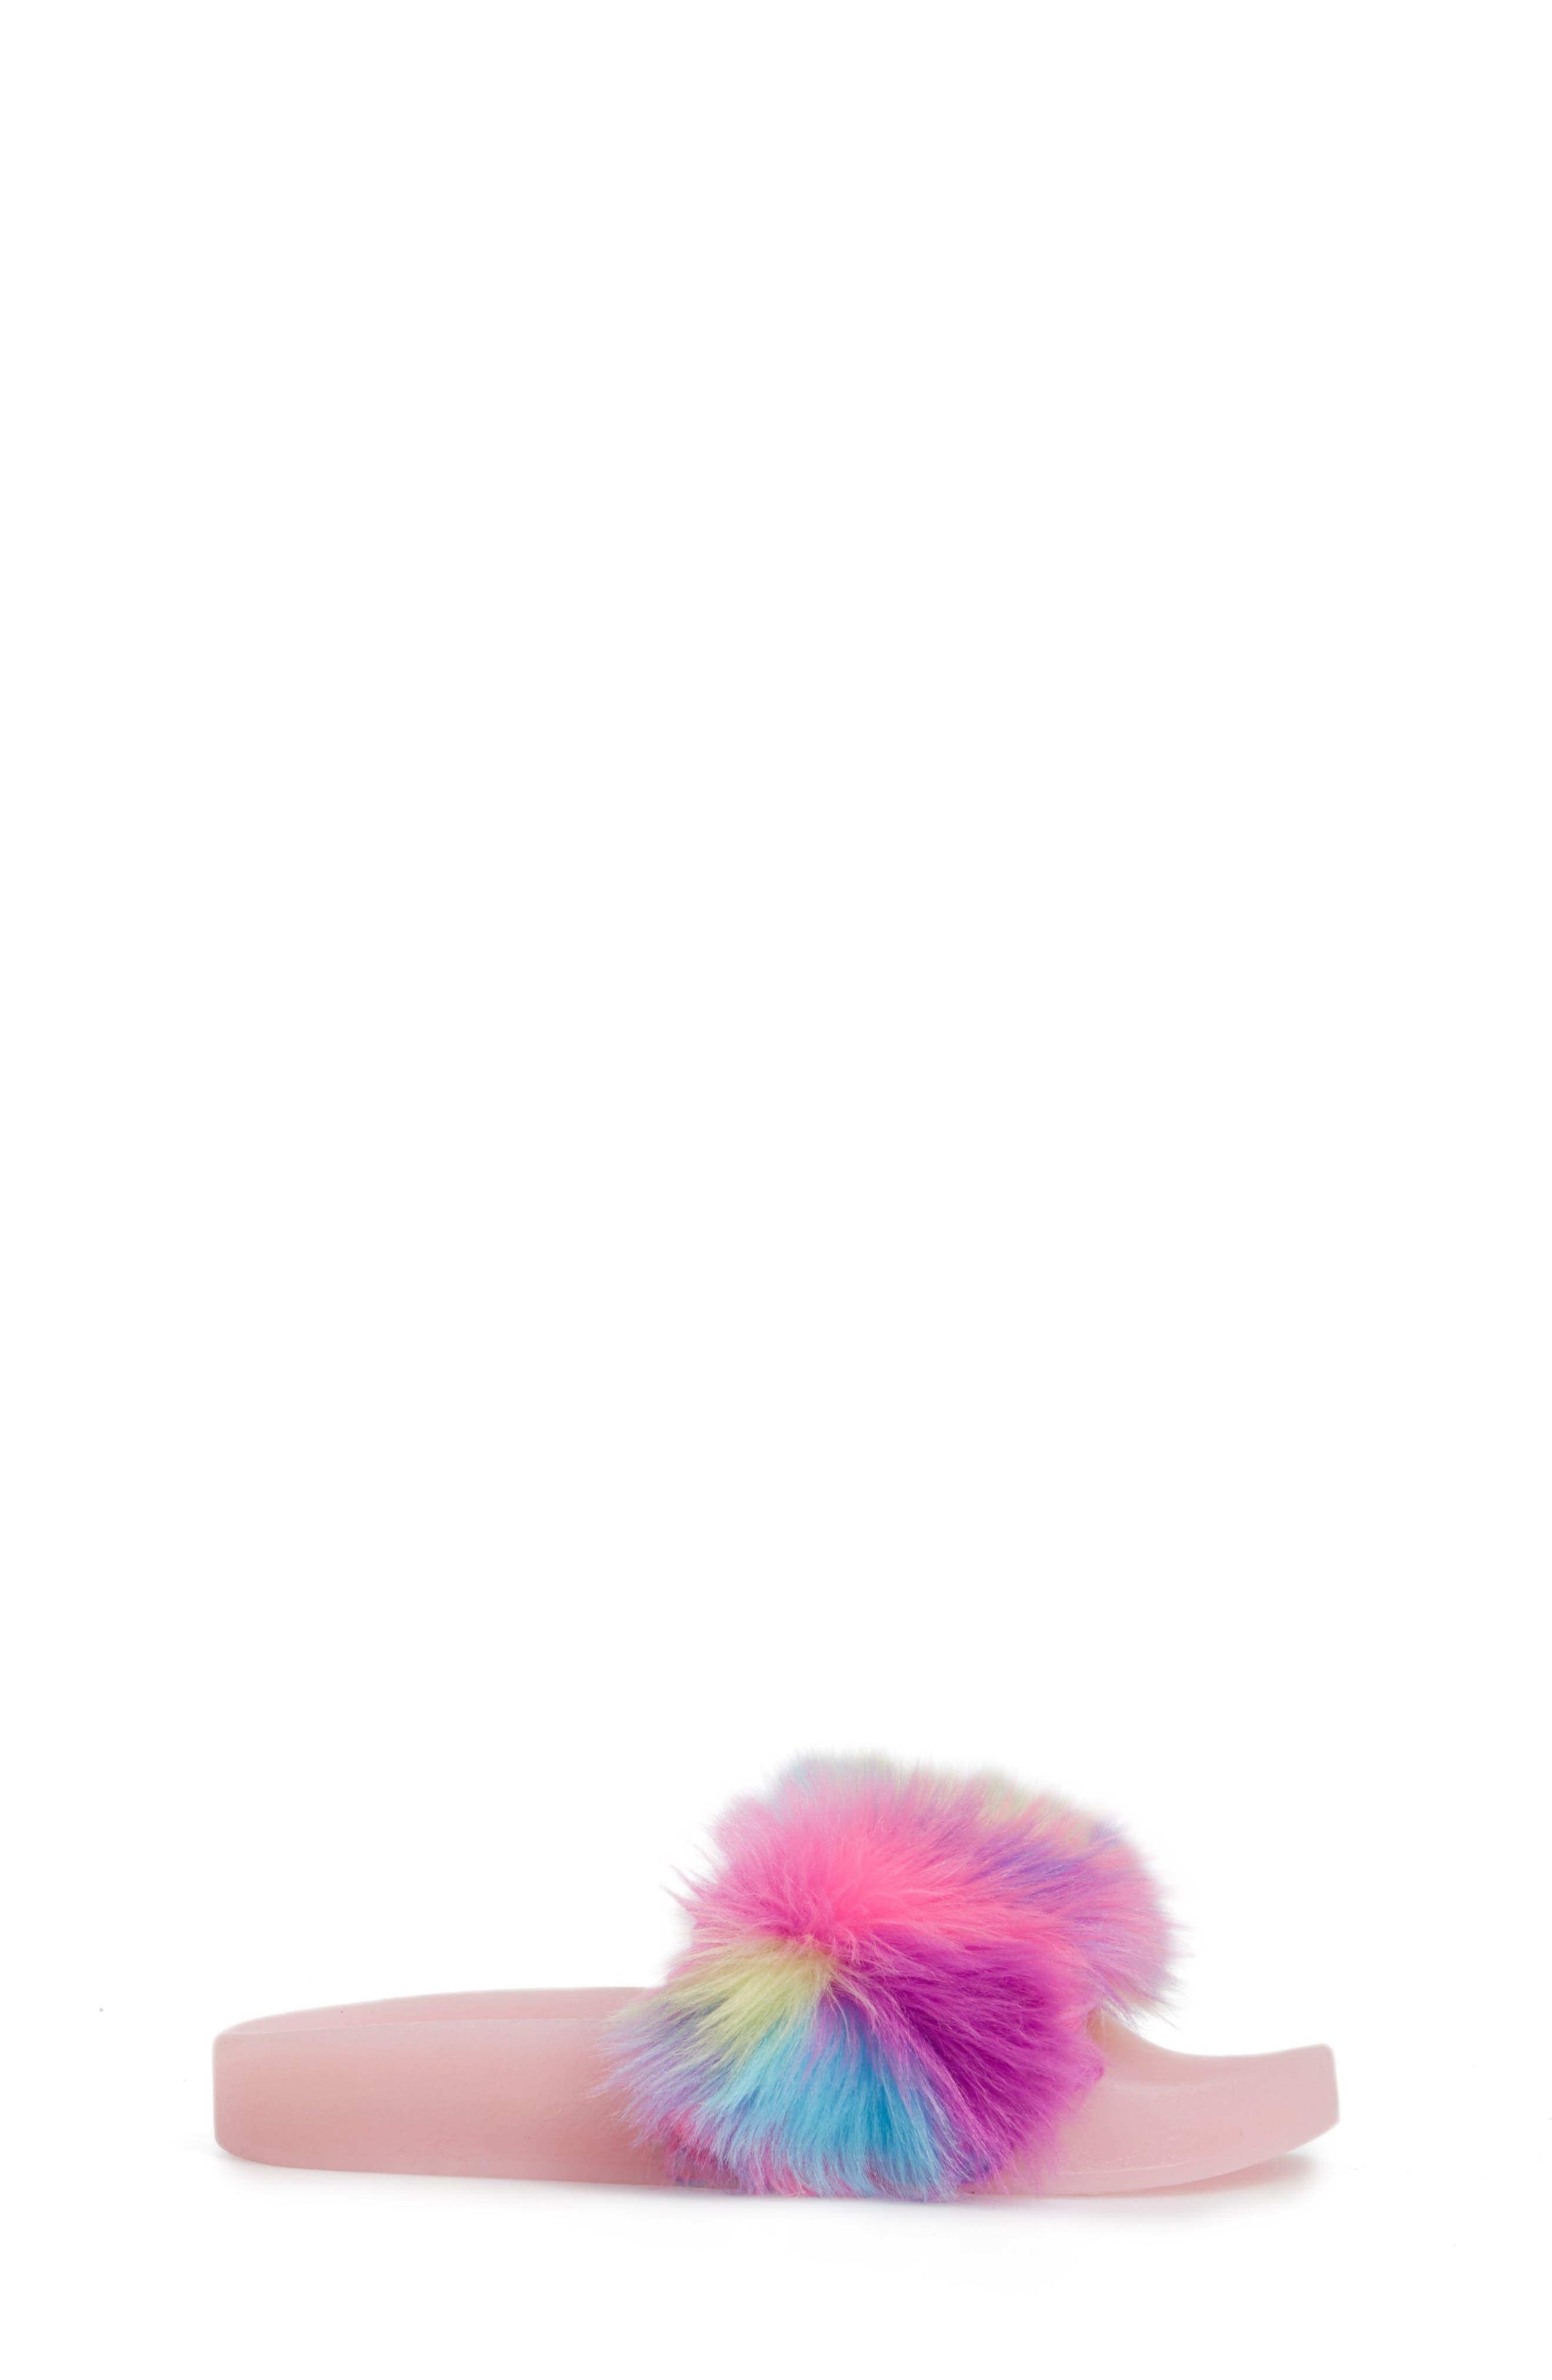 Jlights Faux Fur Light-Up Slide Sandal,                             Alternate thumbnail 3, color,                             650